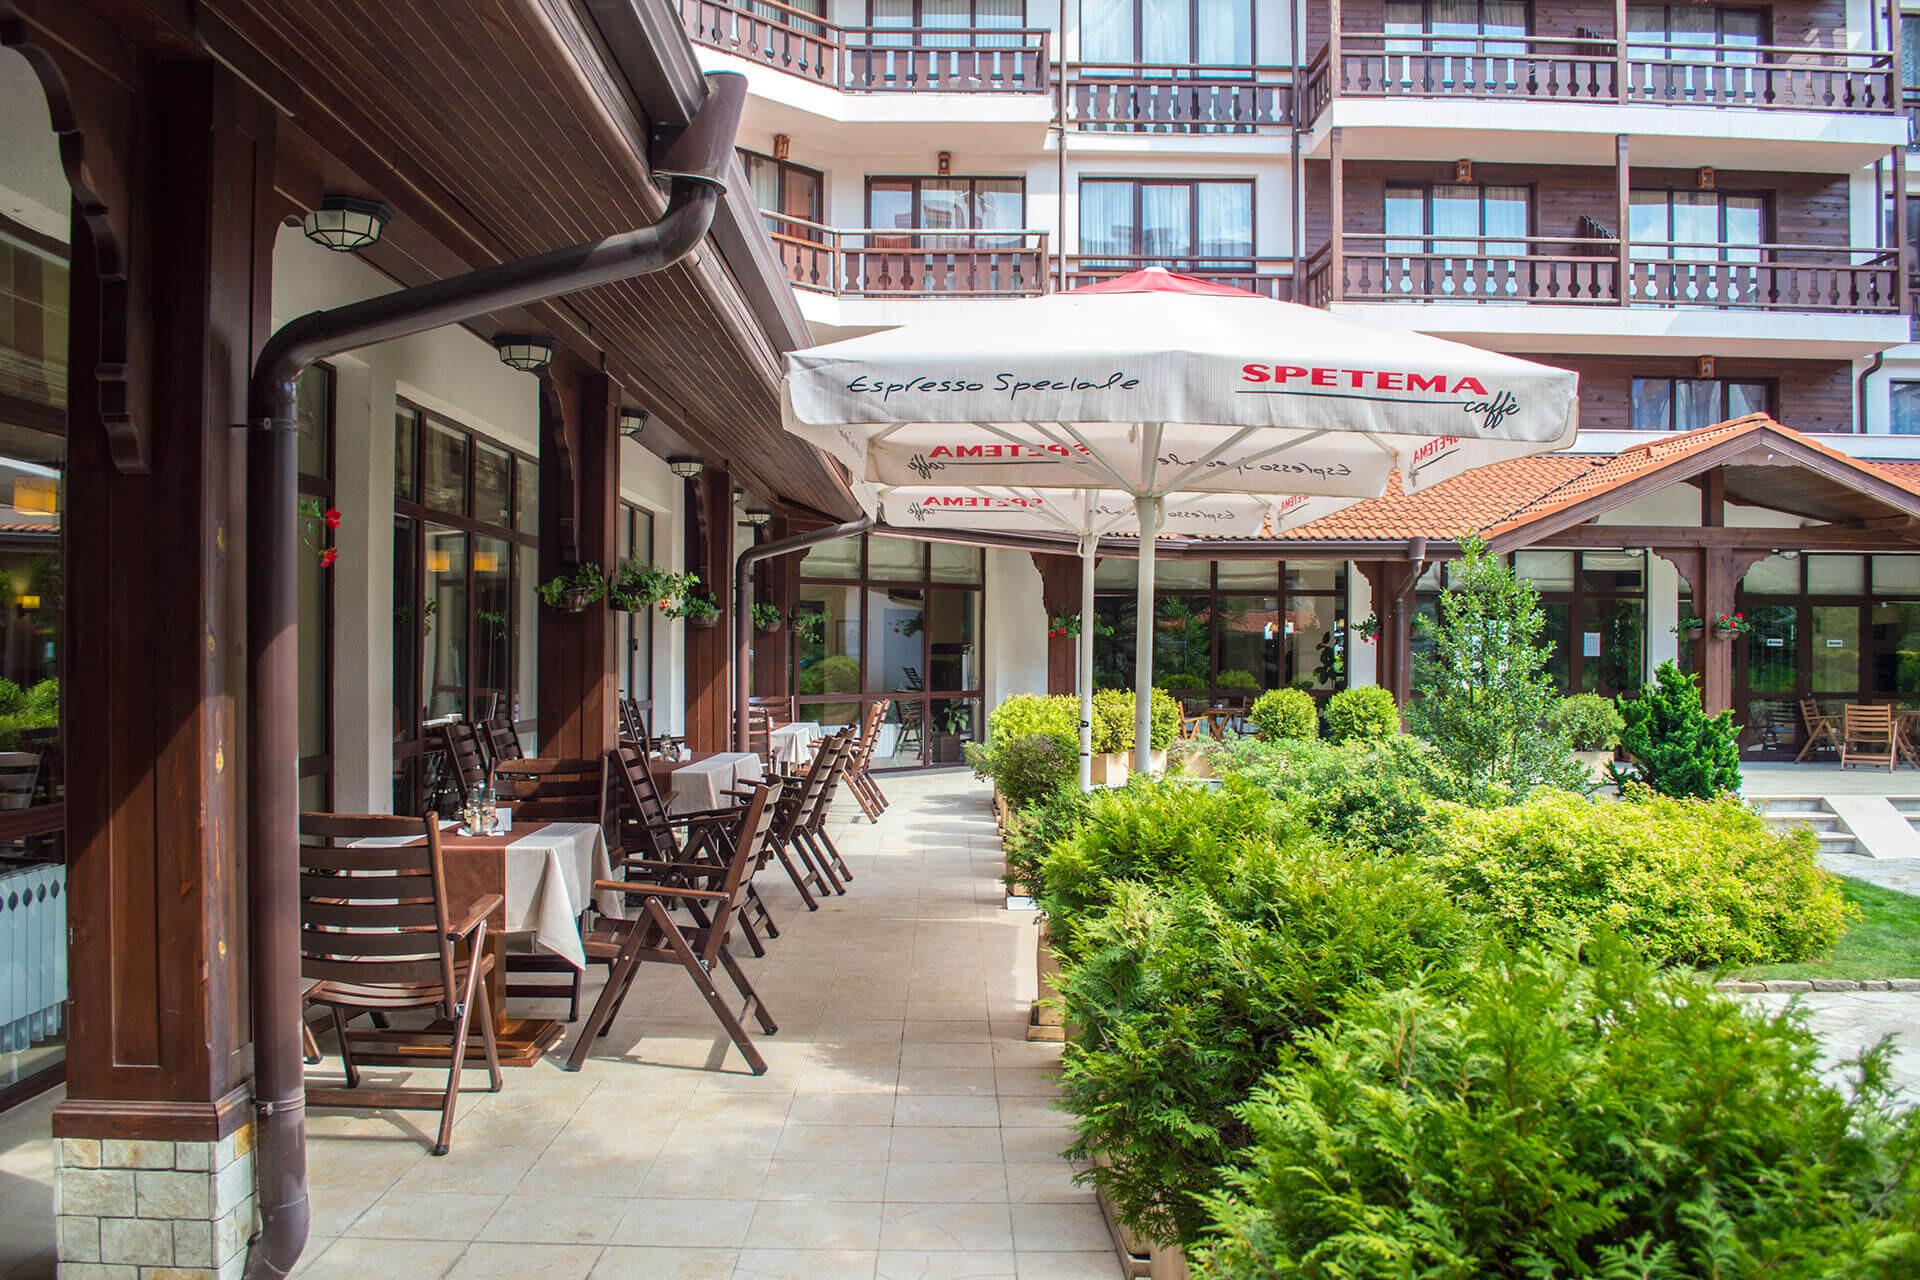 Уинслоу Инфинити & Спа - Банско, България